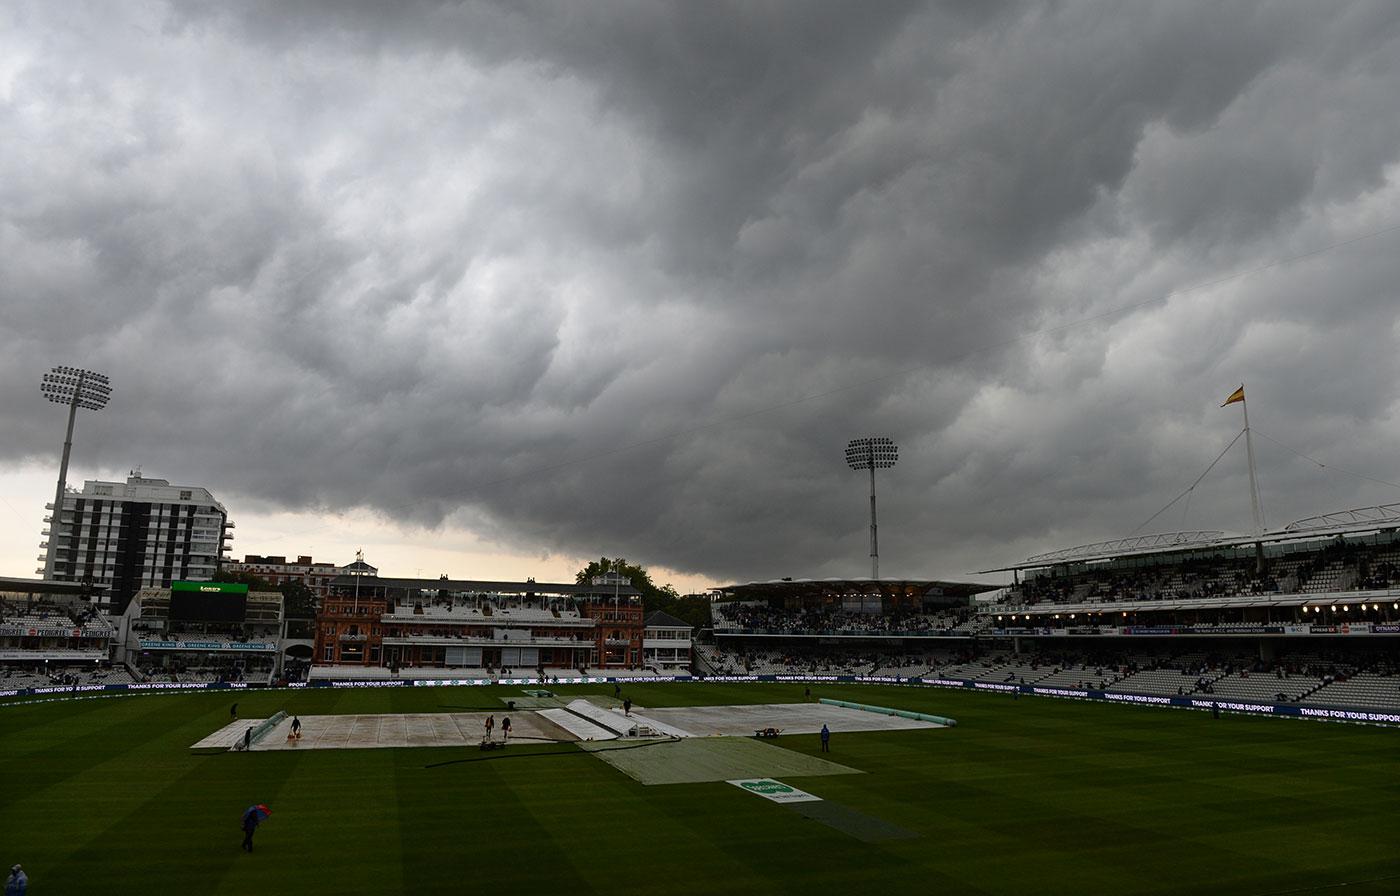 England vs India, Sachin Tendulkar, Lord's